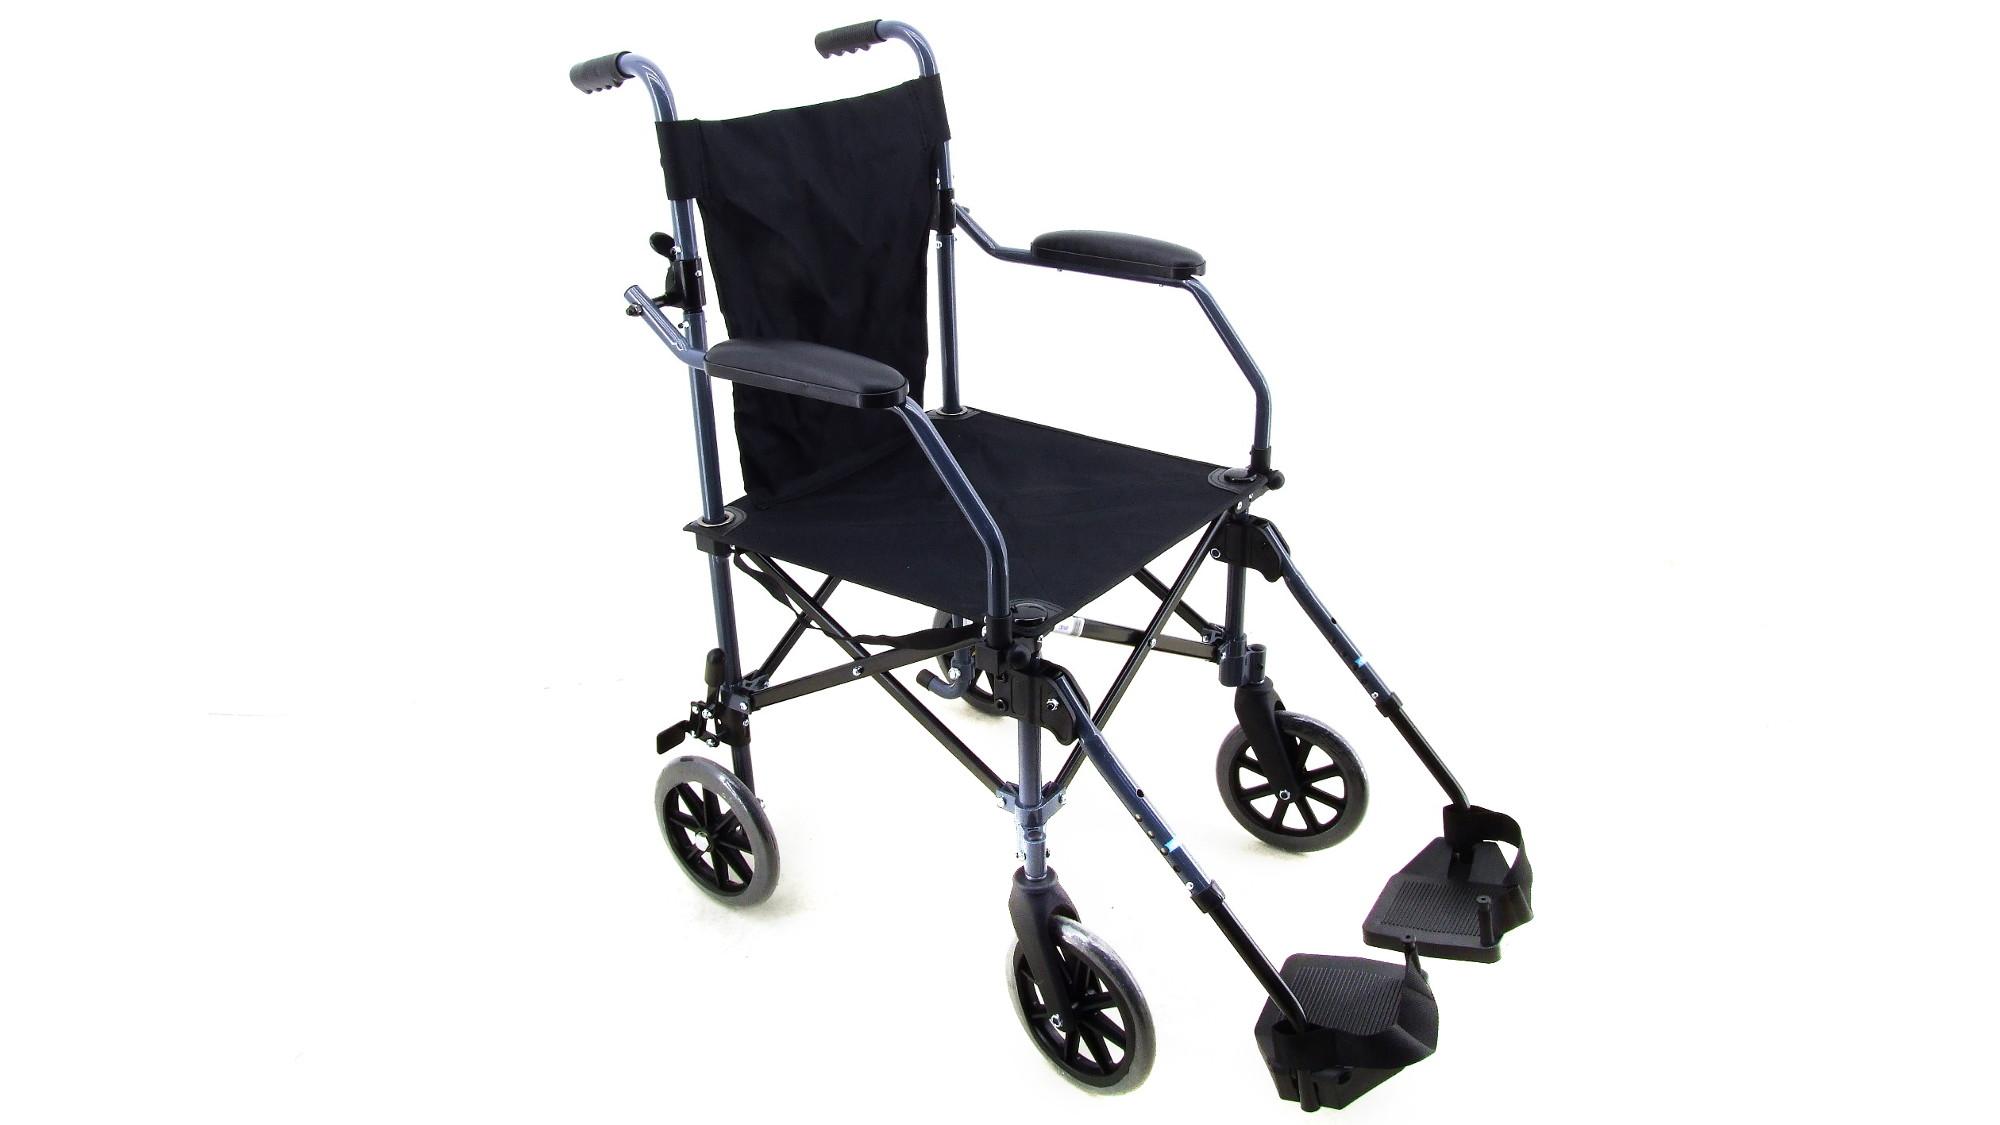 Falt-Rollstuhl leihen